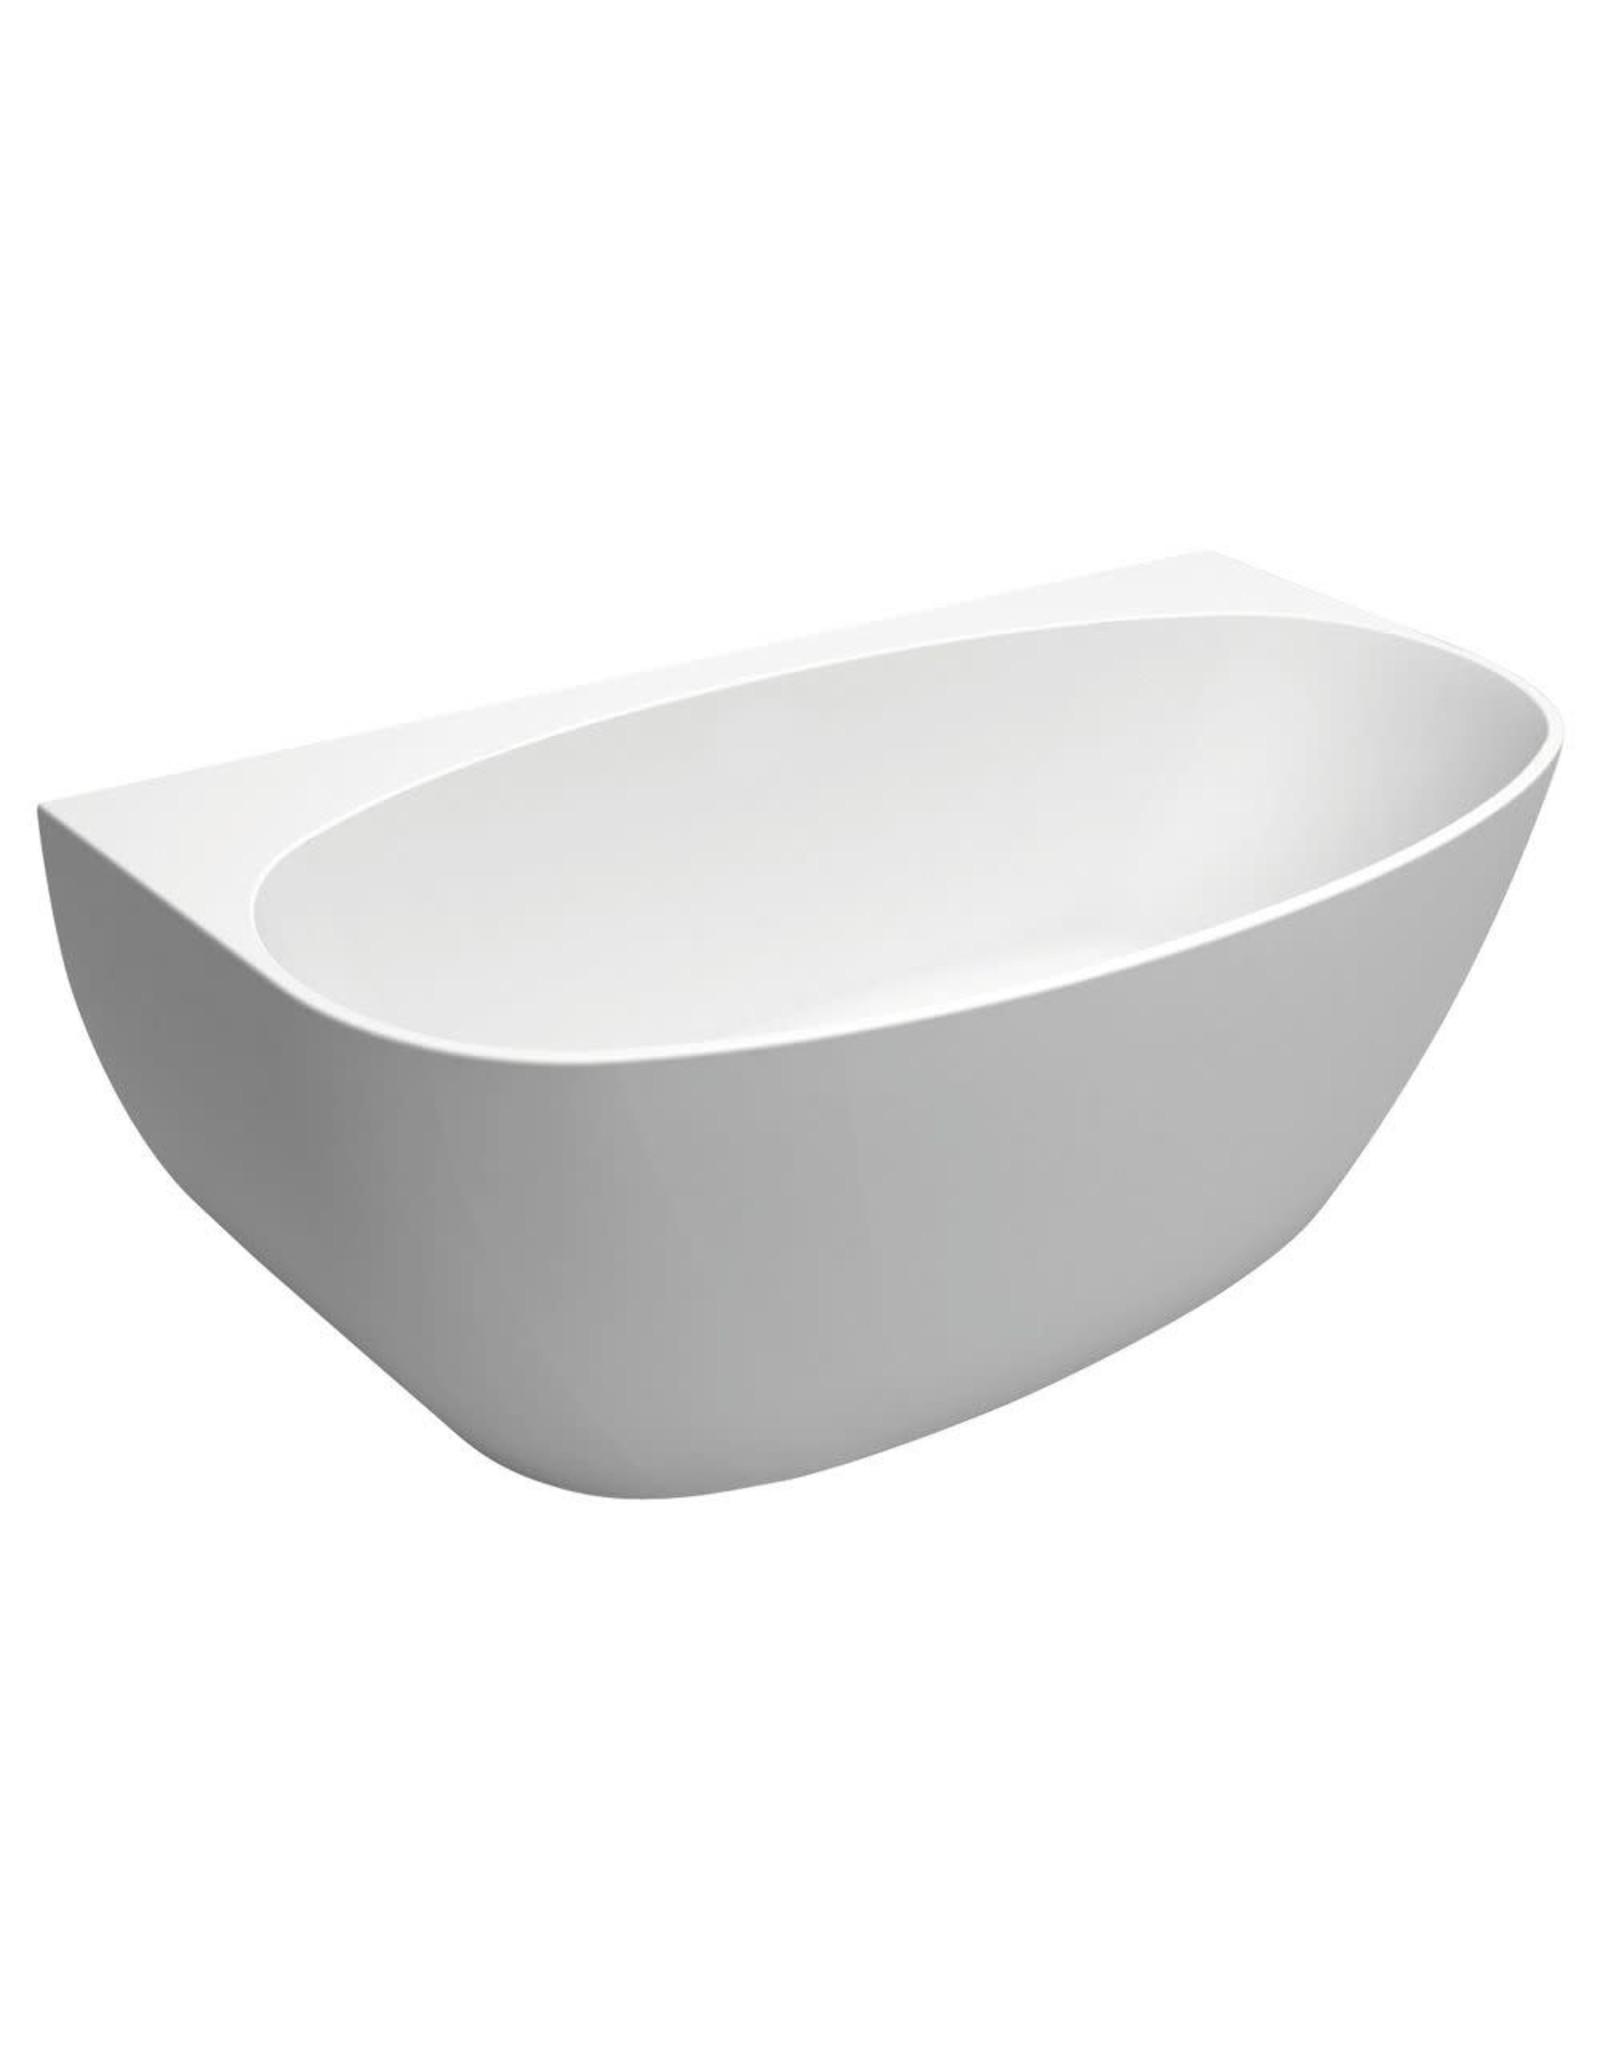 FIENZA 1500mm, FIENZA, KEETO Back-to-wall Acrylic Bath - INCLUDES CHROME WASTE